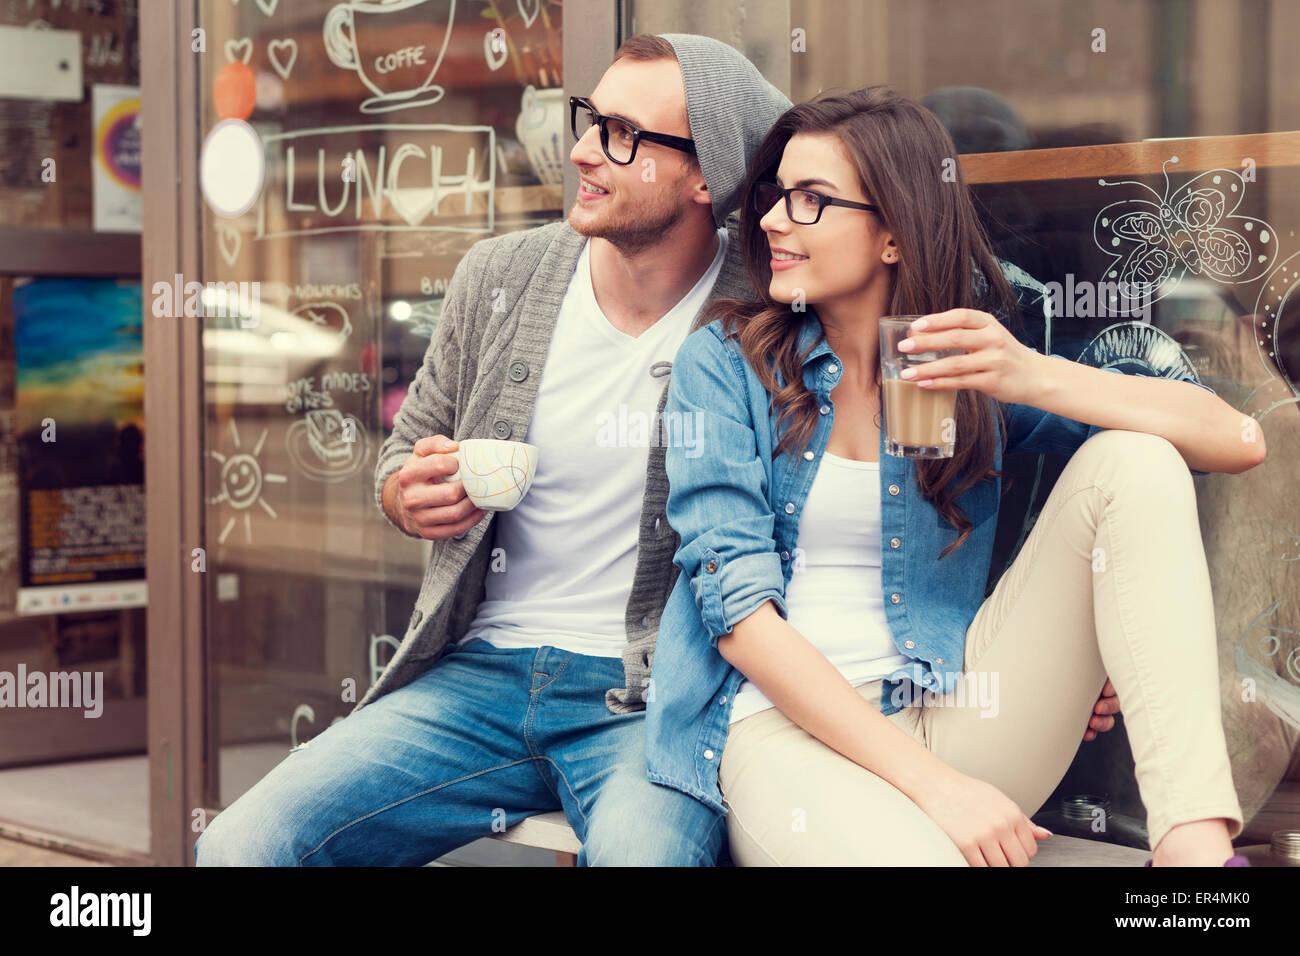 Porträt von stilvollen paar am außerhalb Café. Krakau, Polen Stockbild